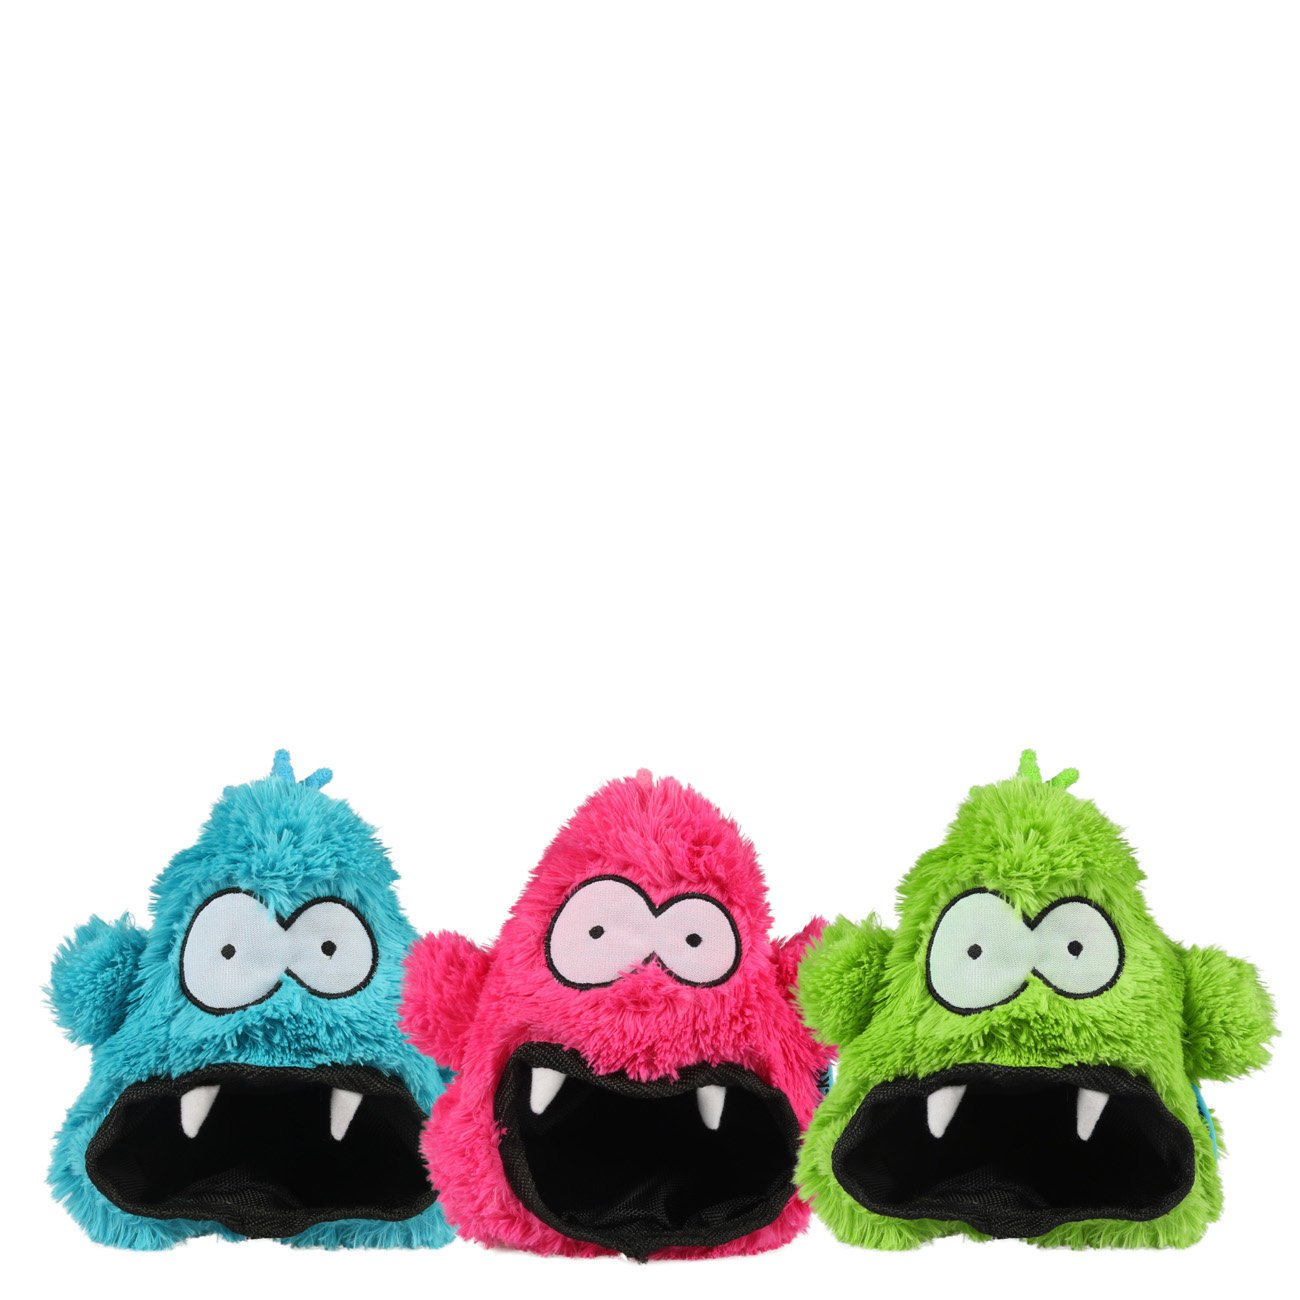 Coockoo Plüsch Monster Hundespielzeug, Bild 2